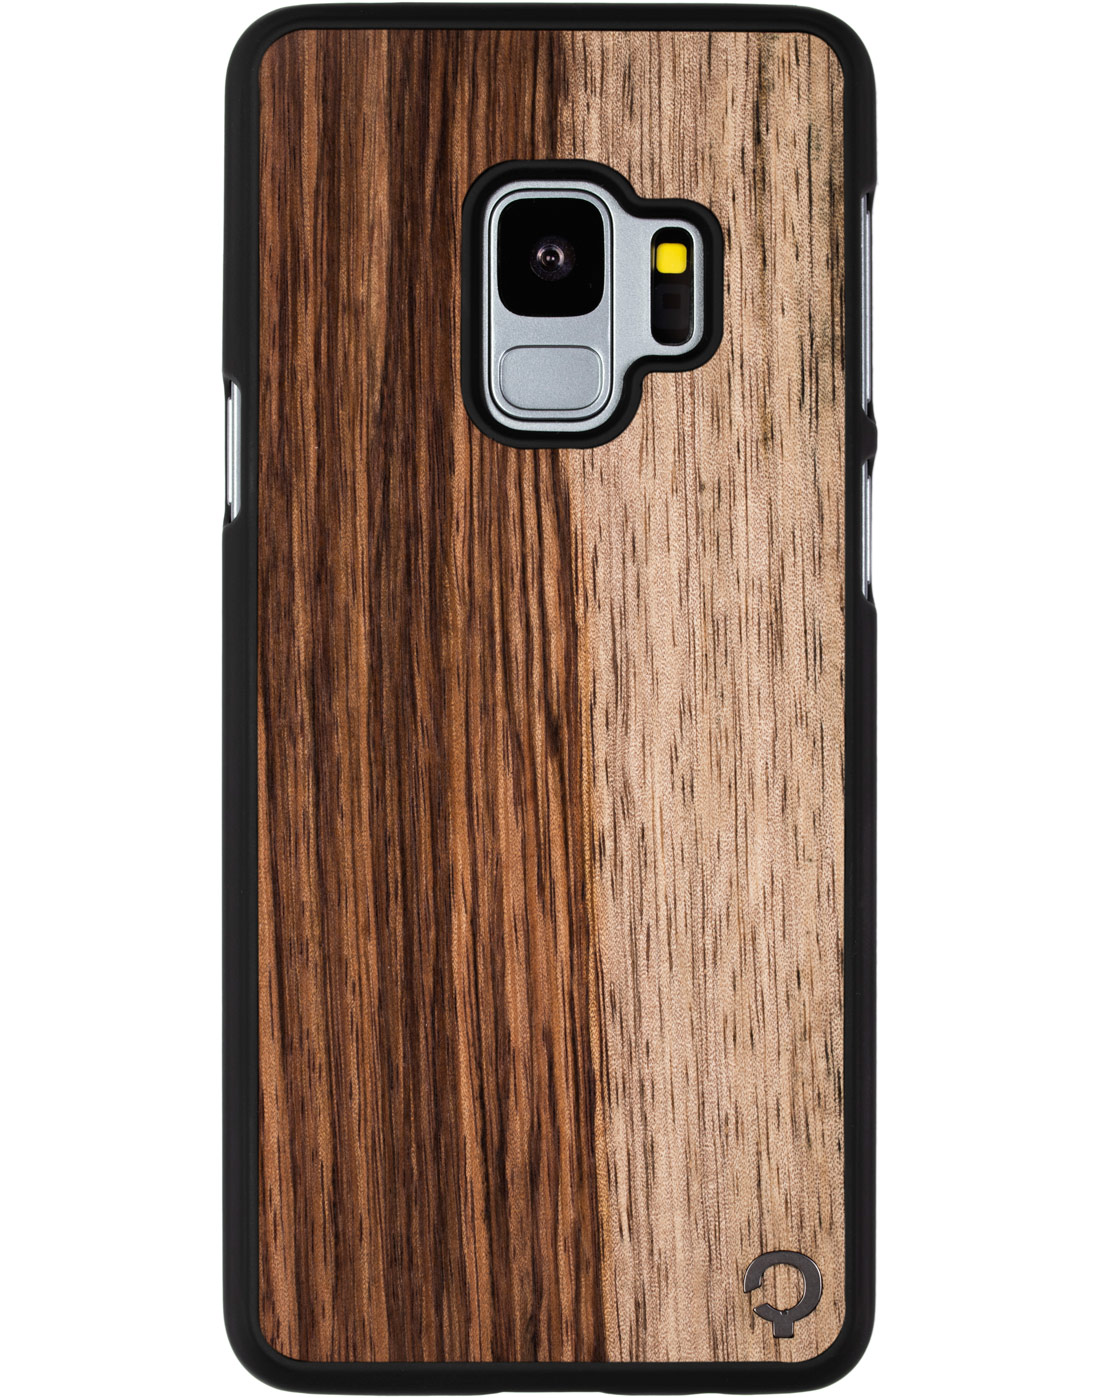 finest selection 63f46 674a5 Wooden Case - Samsung Galaxy S9 - Premium - Mango